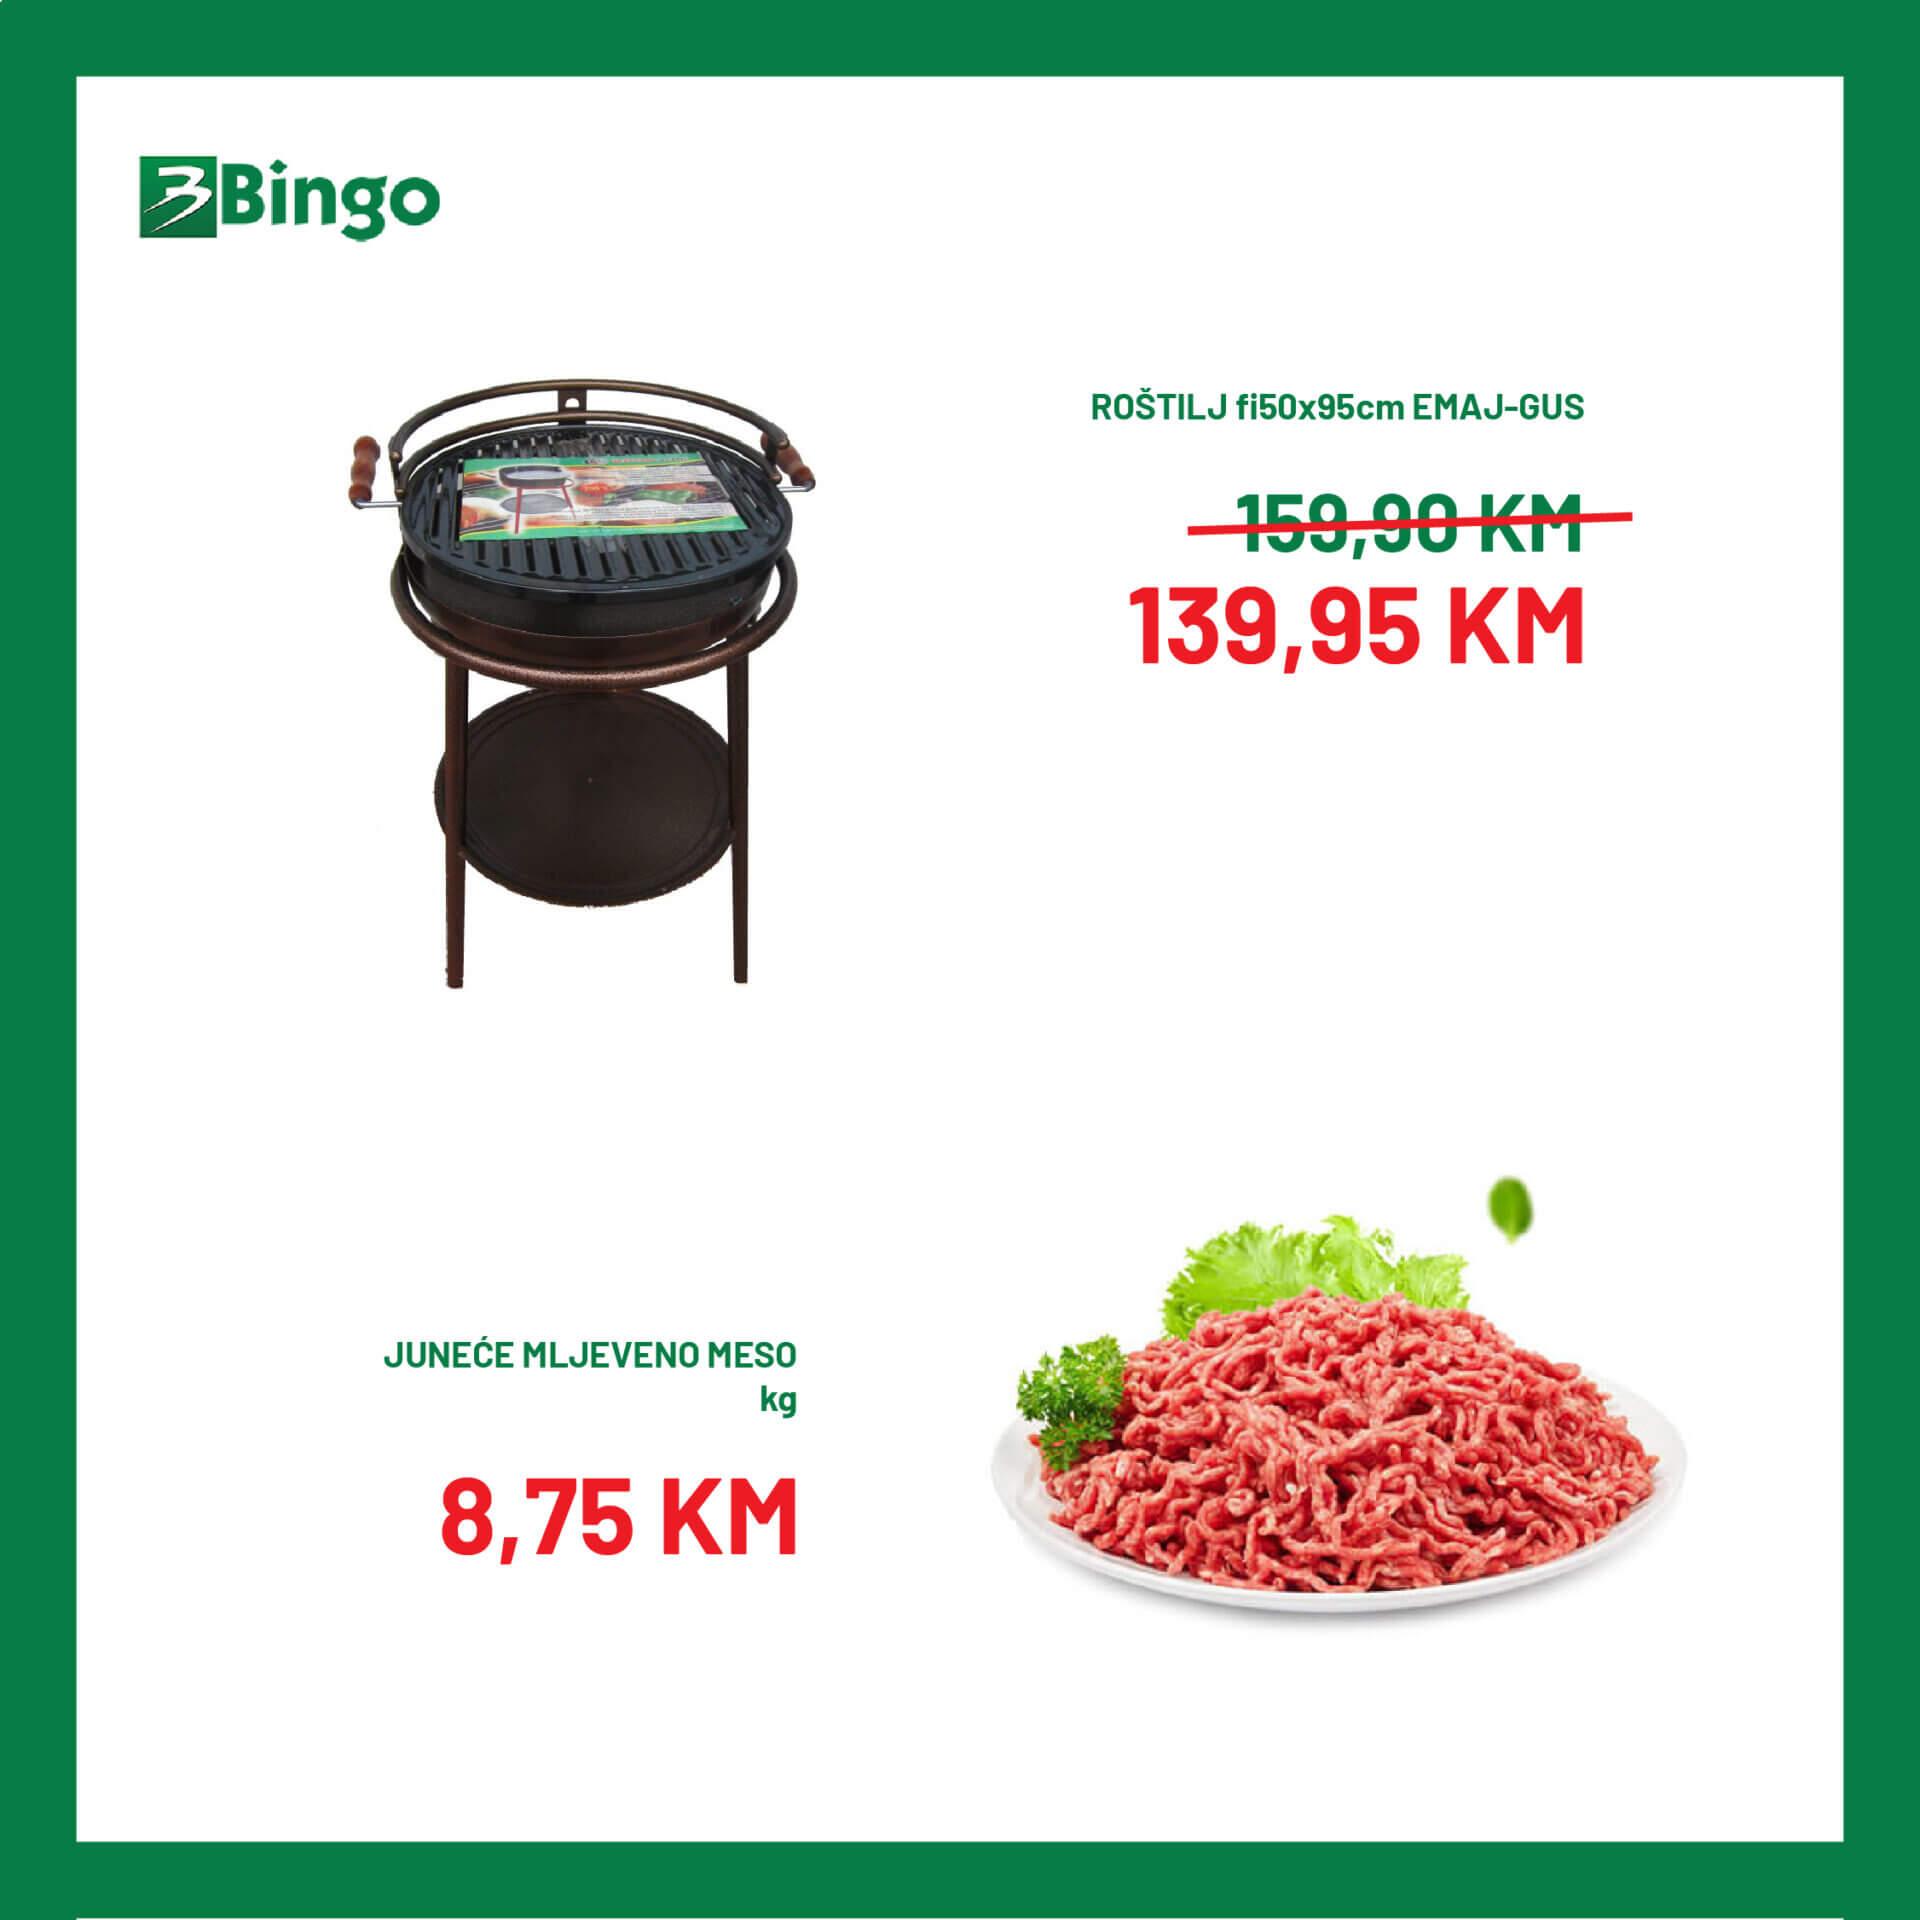 BINGO katalog Page 3